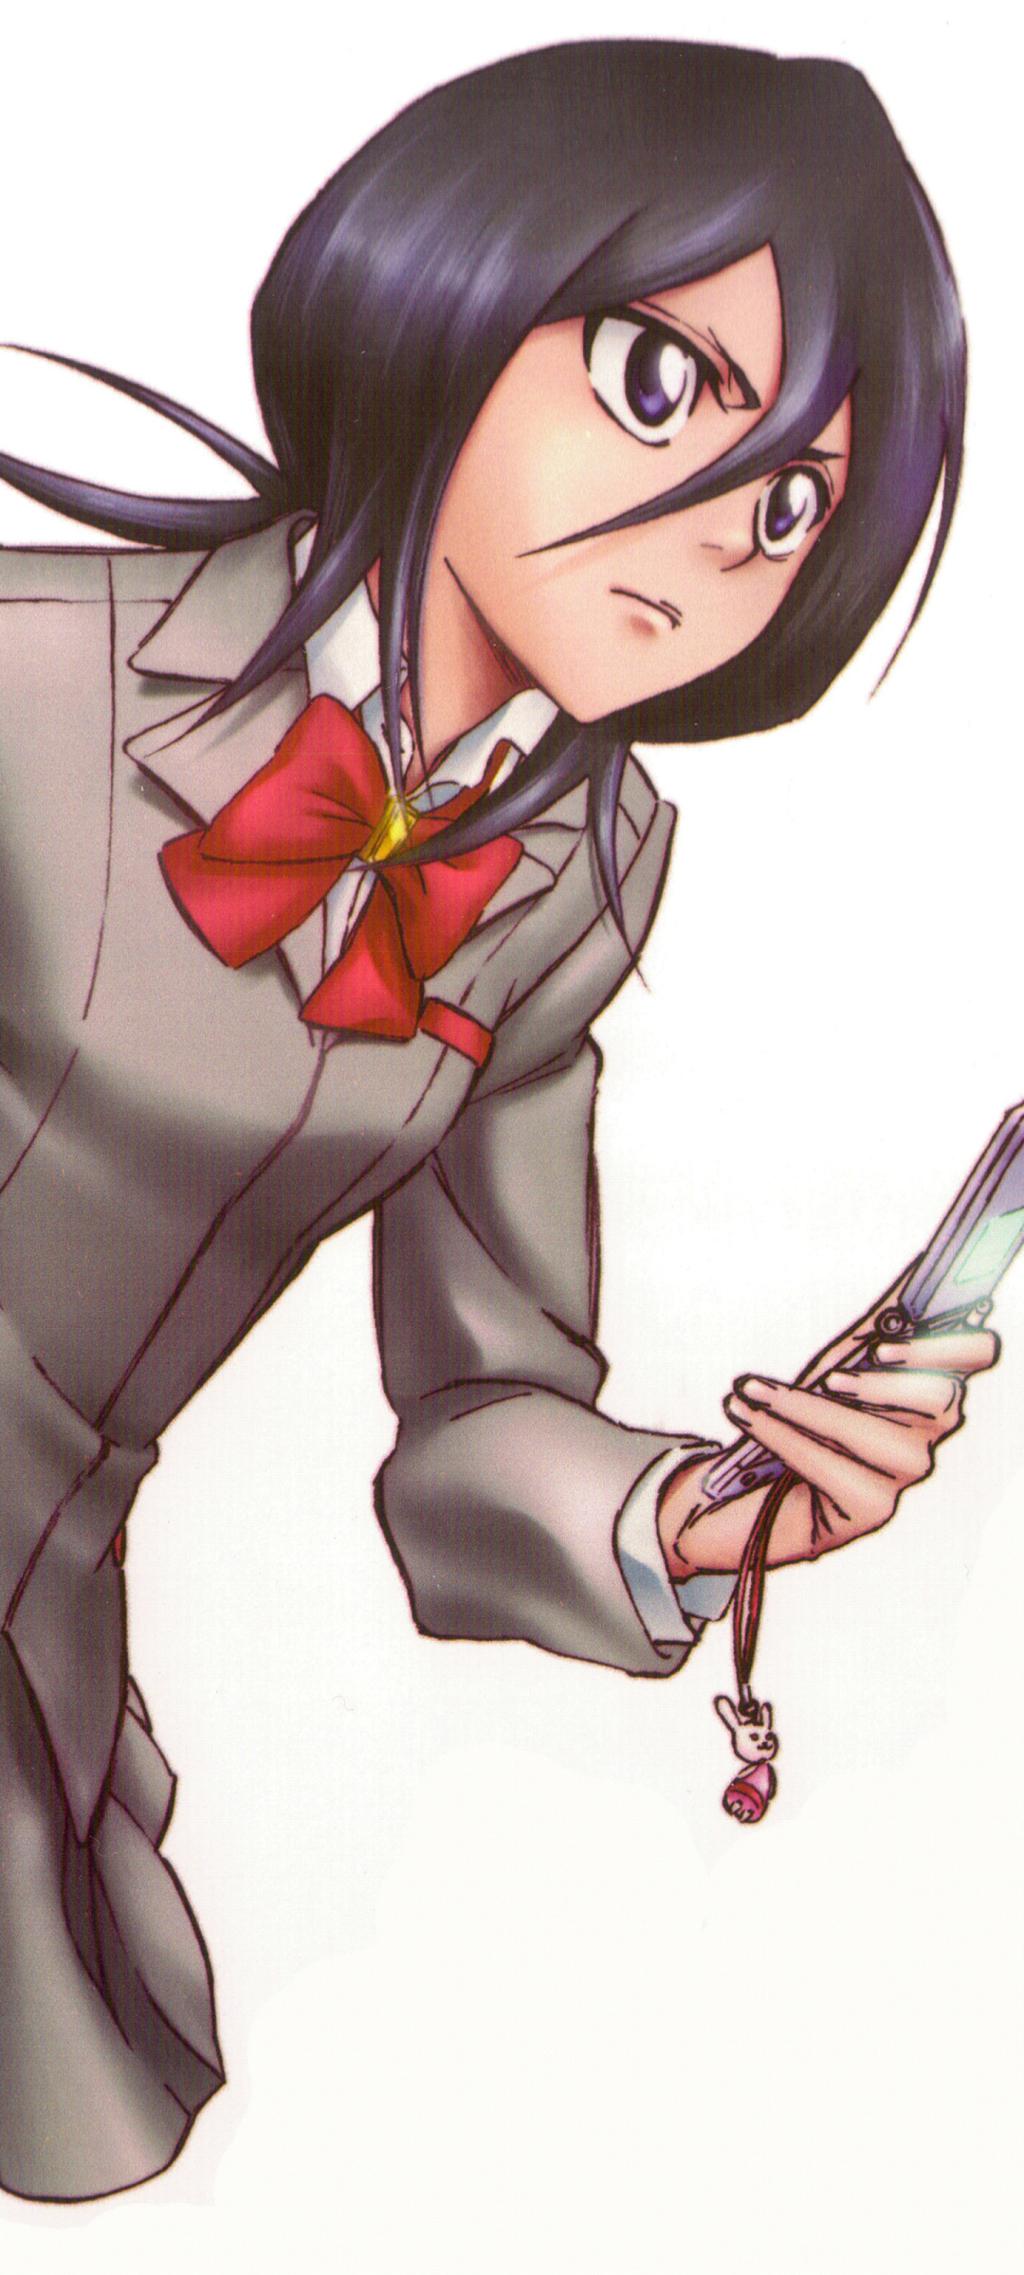 Anime Bleach wallpaper Desktop Phone Awesome Desktop